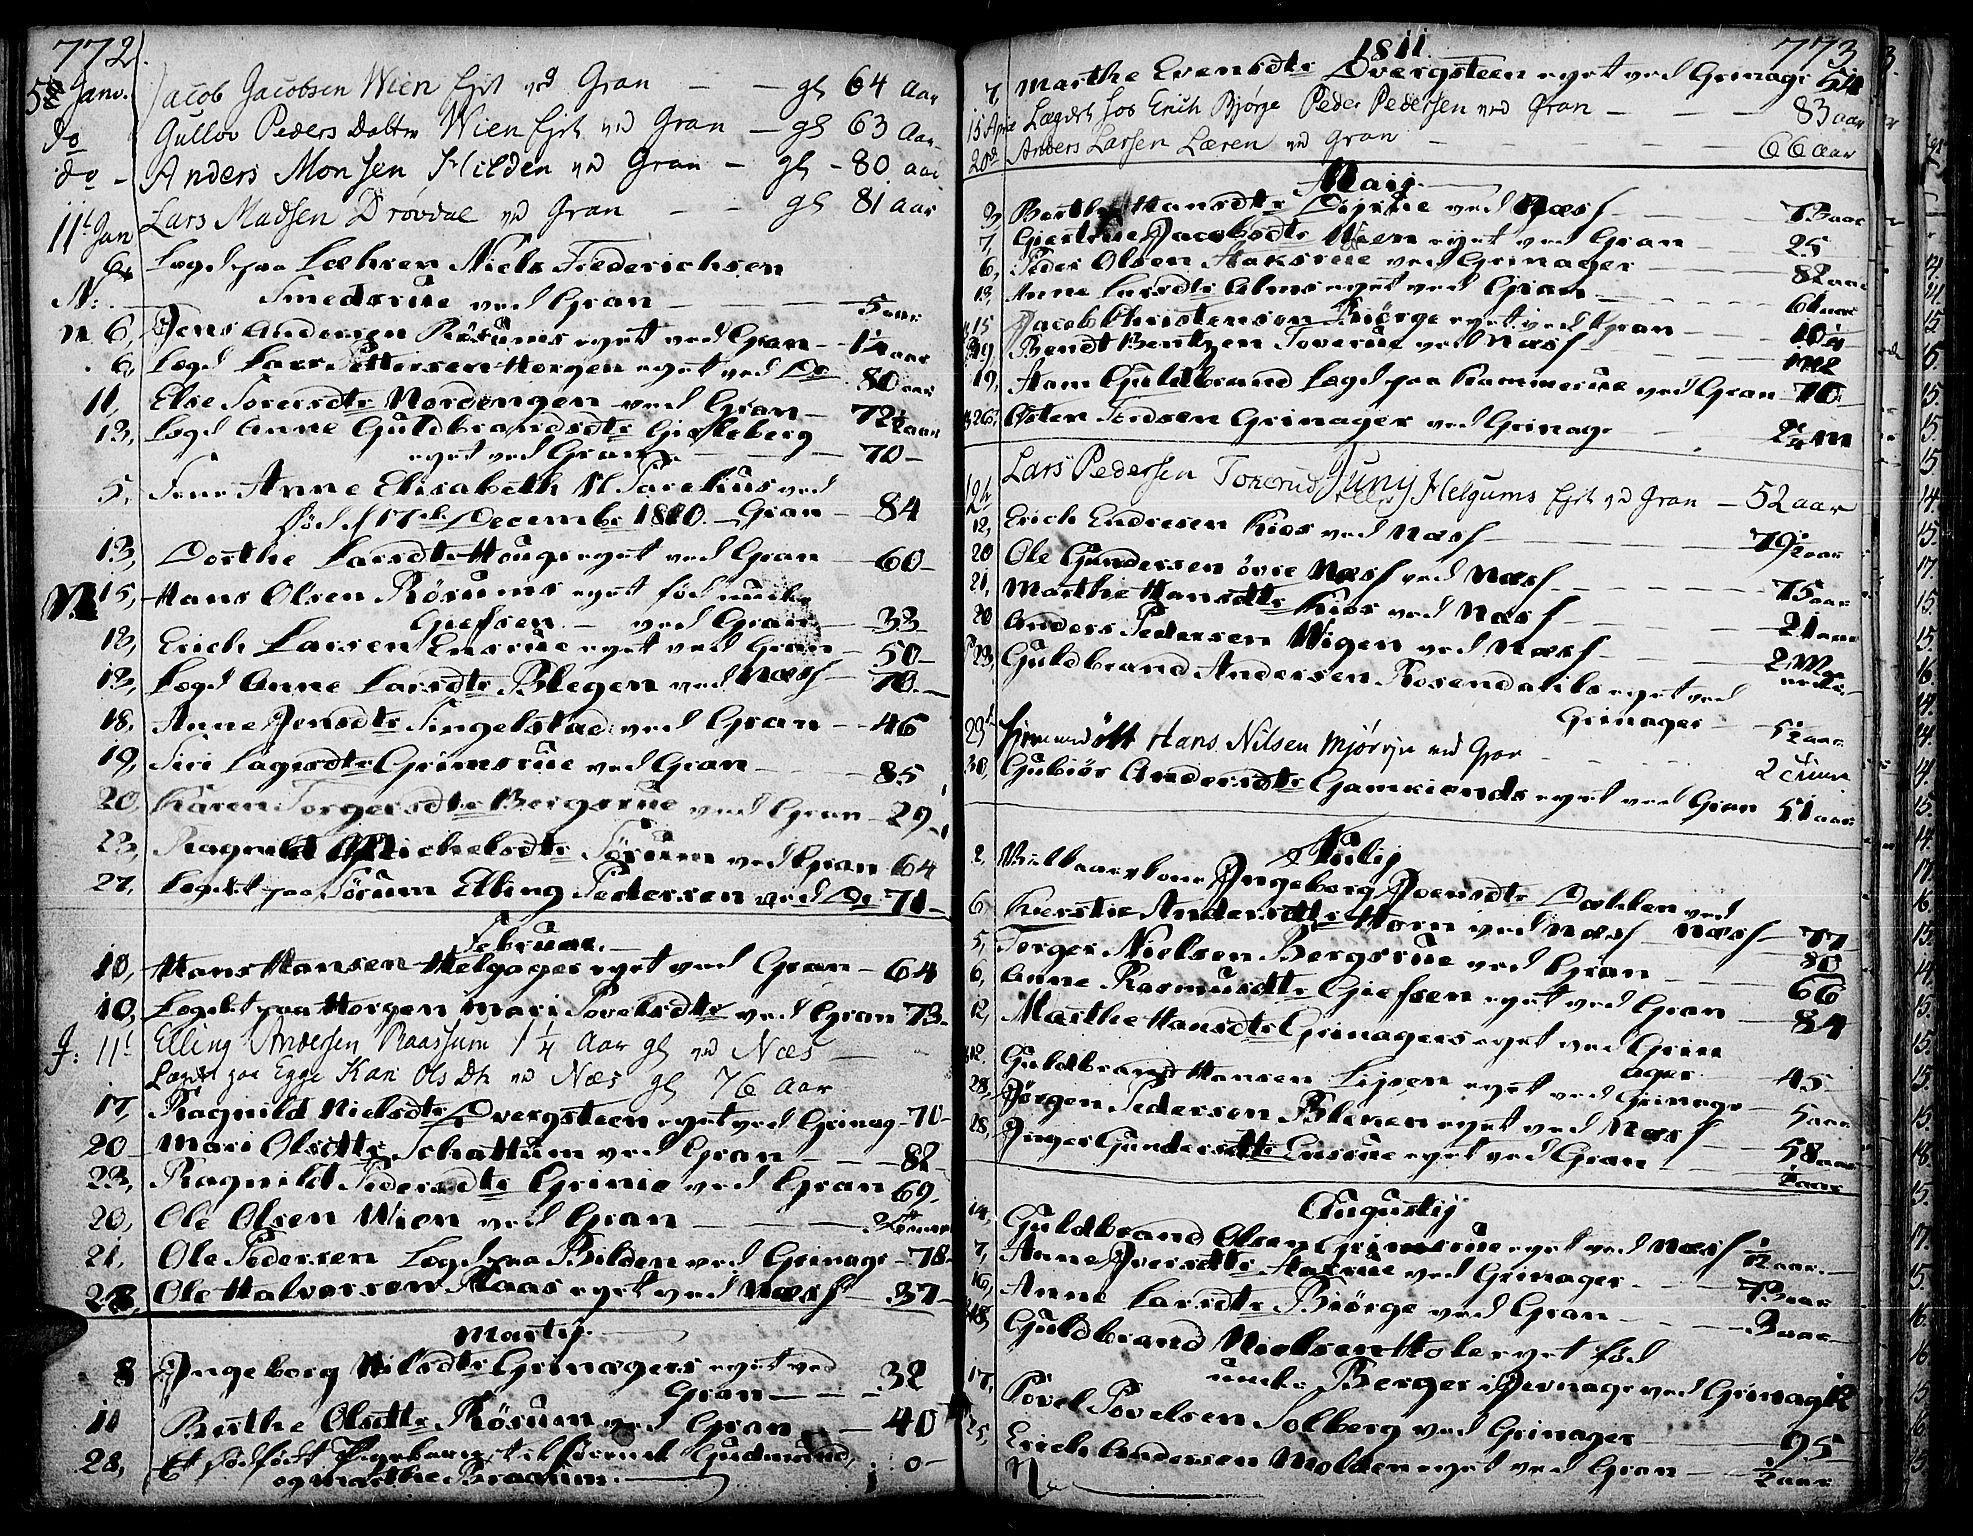 SAH, Gran prestekontor, Ministerialbok nr. 6, 1787-1824, s. 772-773